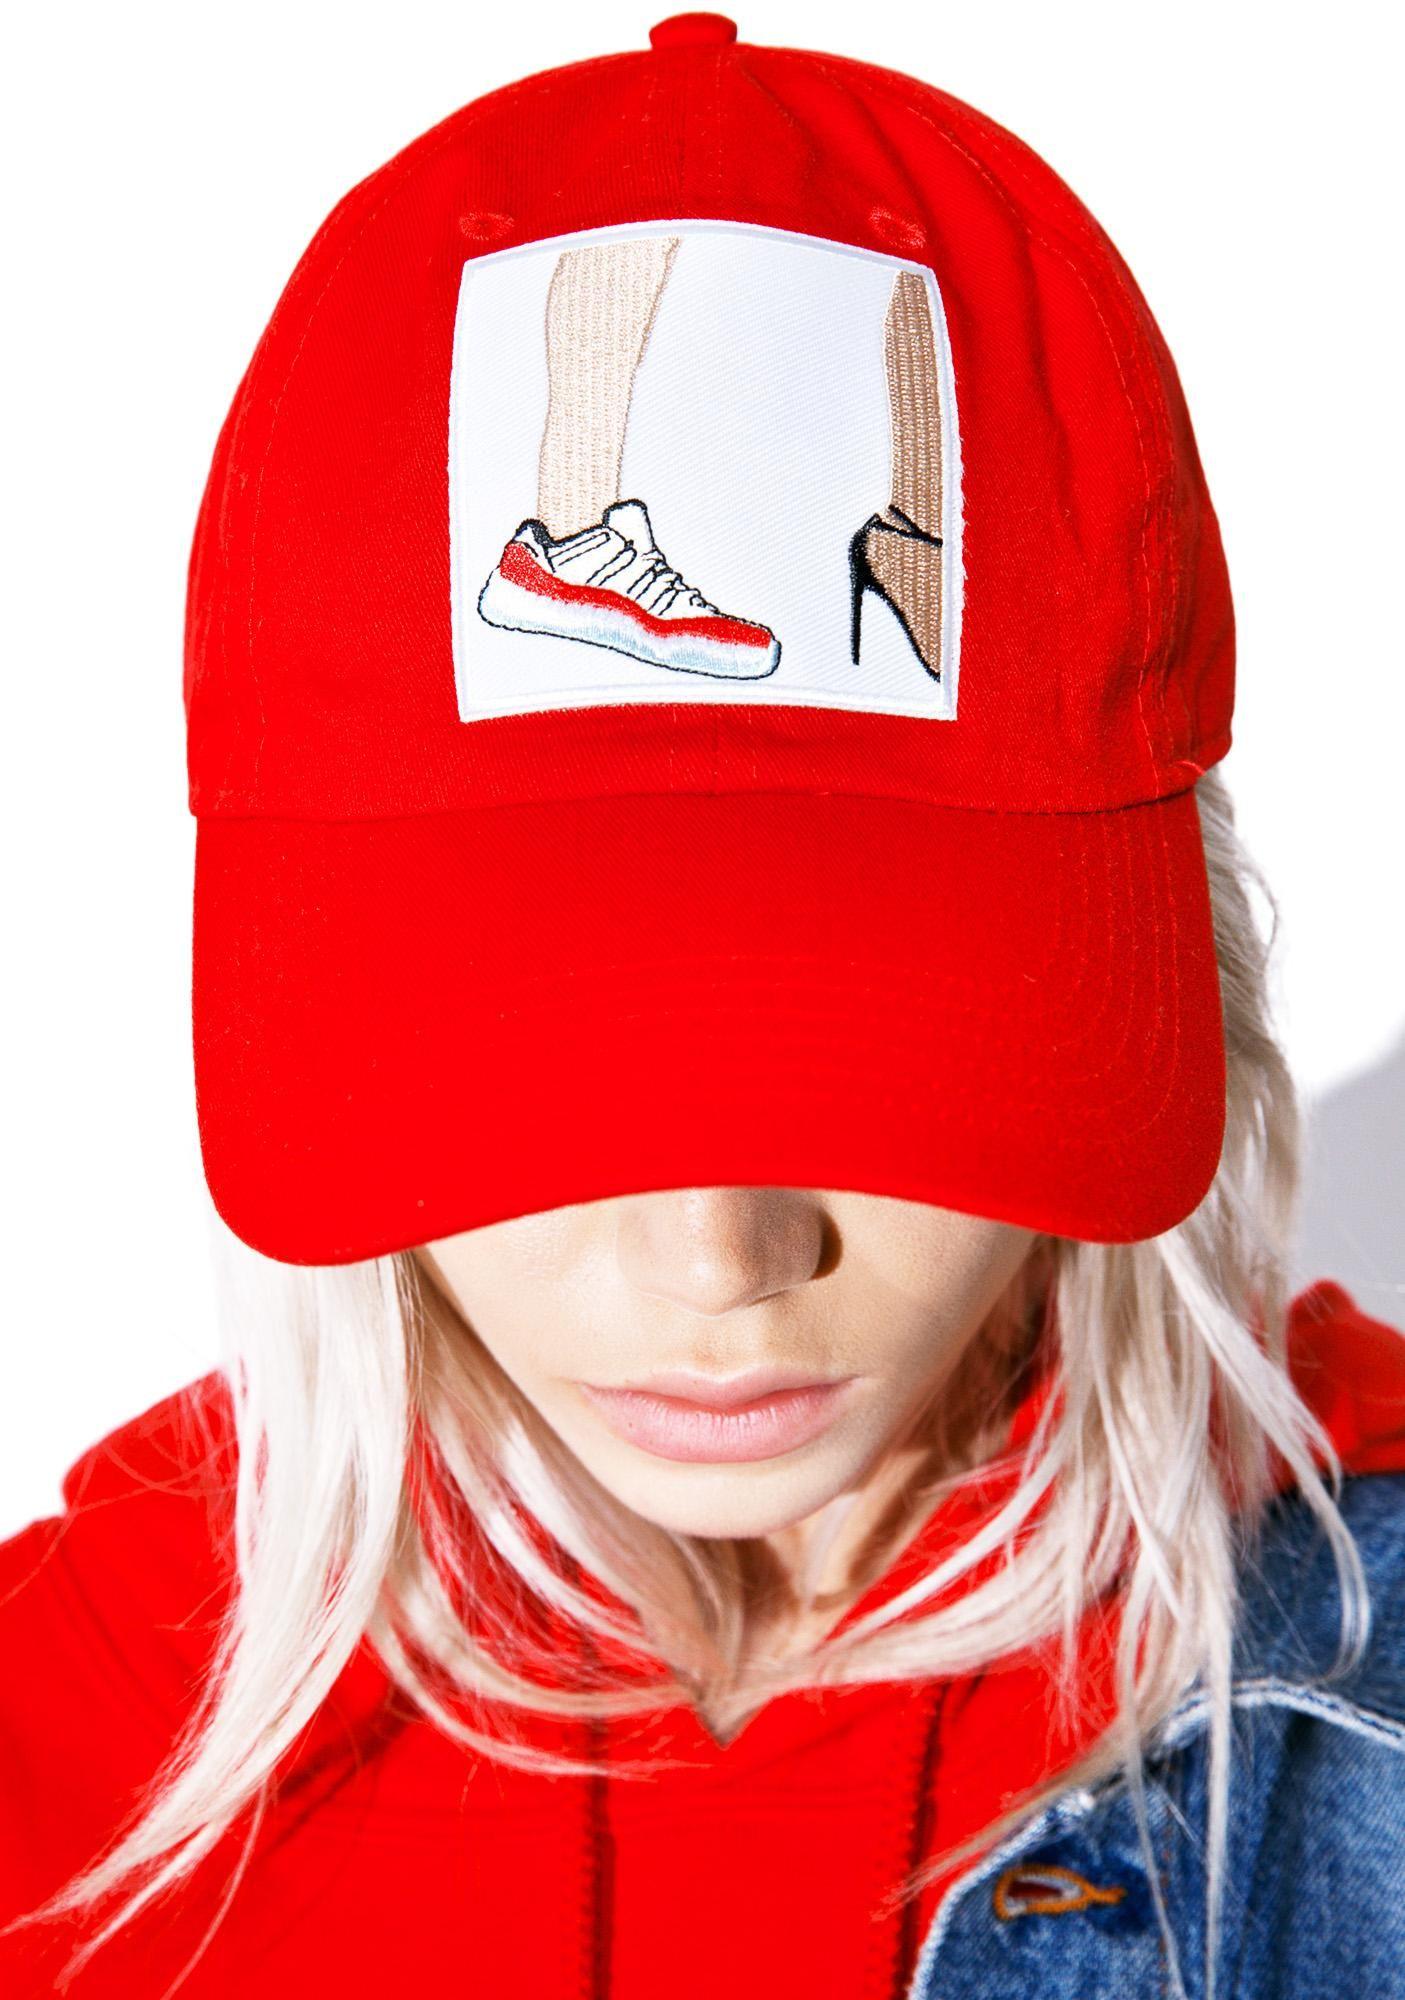 c79d3b86931 In My J s Dad Hat is gunna dunk on  em